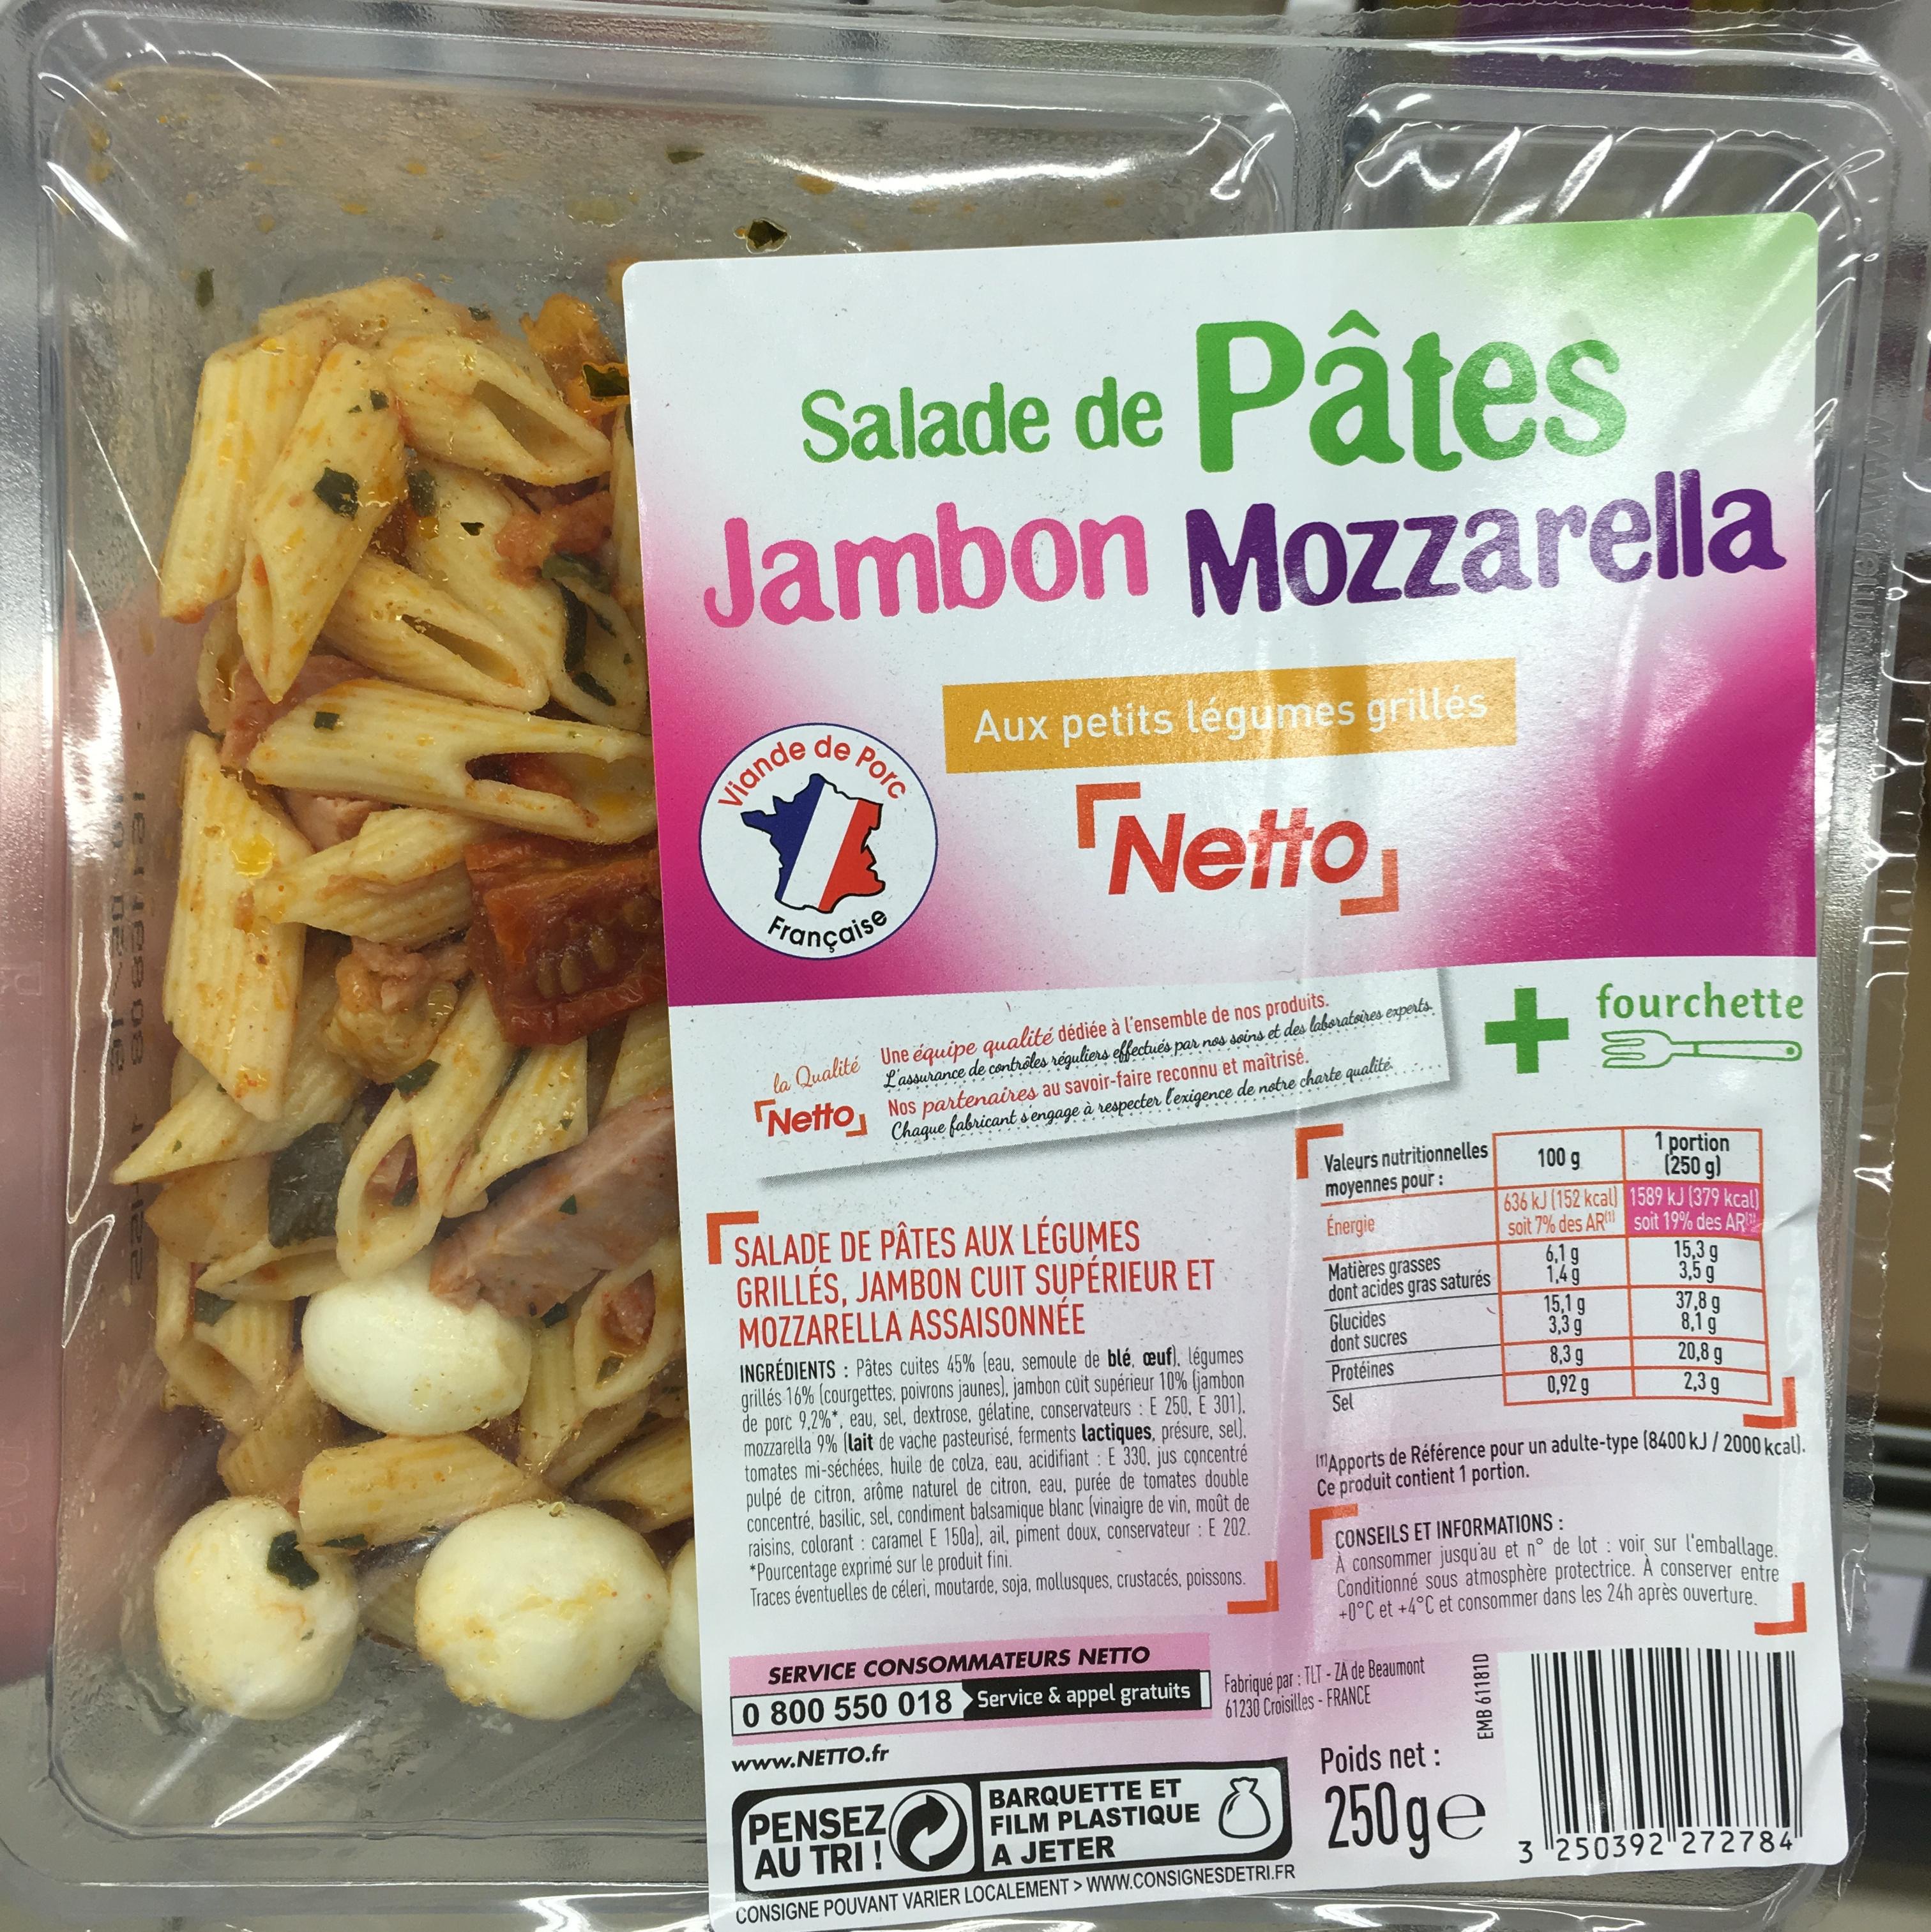 Salade de p tes jambon mozzarella aux petits l gumes grill s netto 250 g - Salade de pates jambon ...